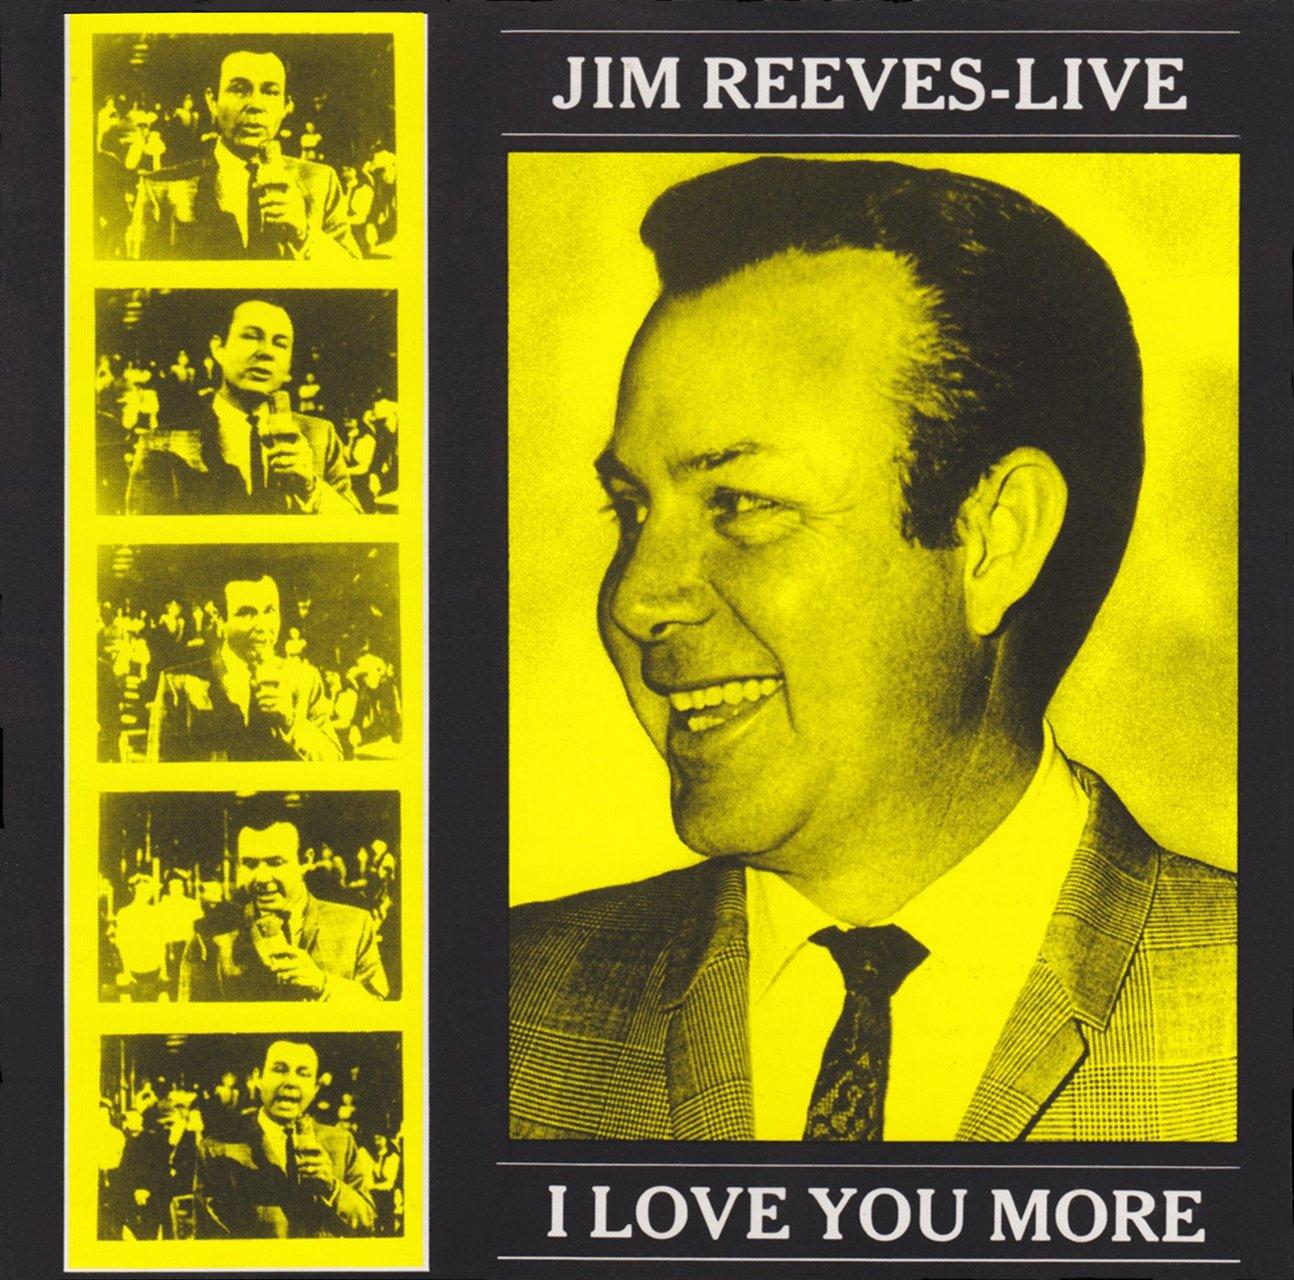 Live: I Love You More